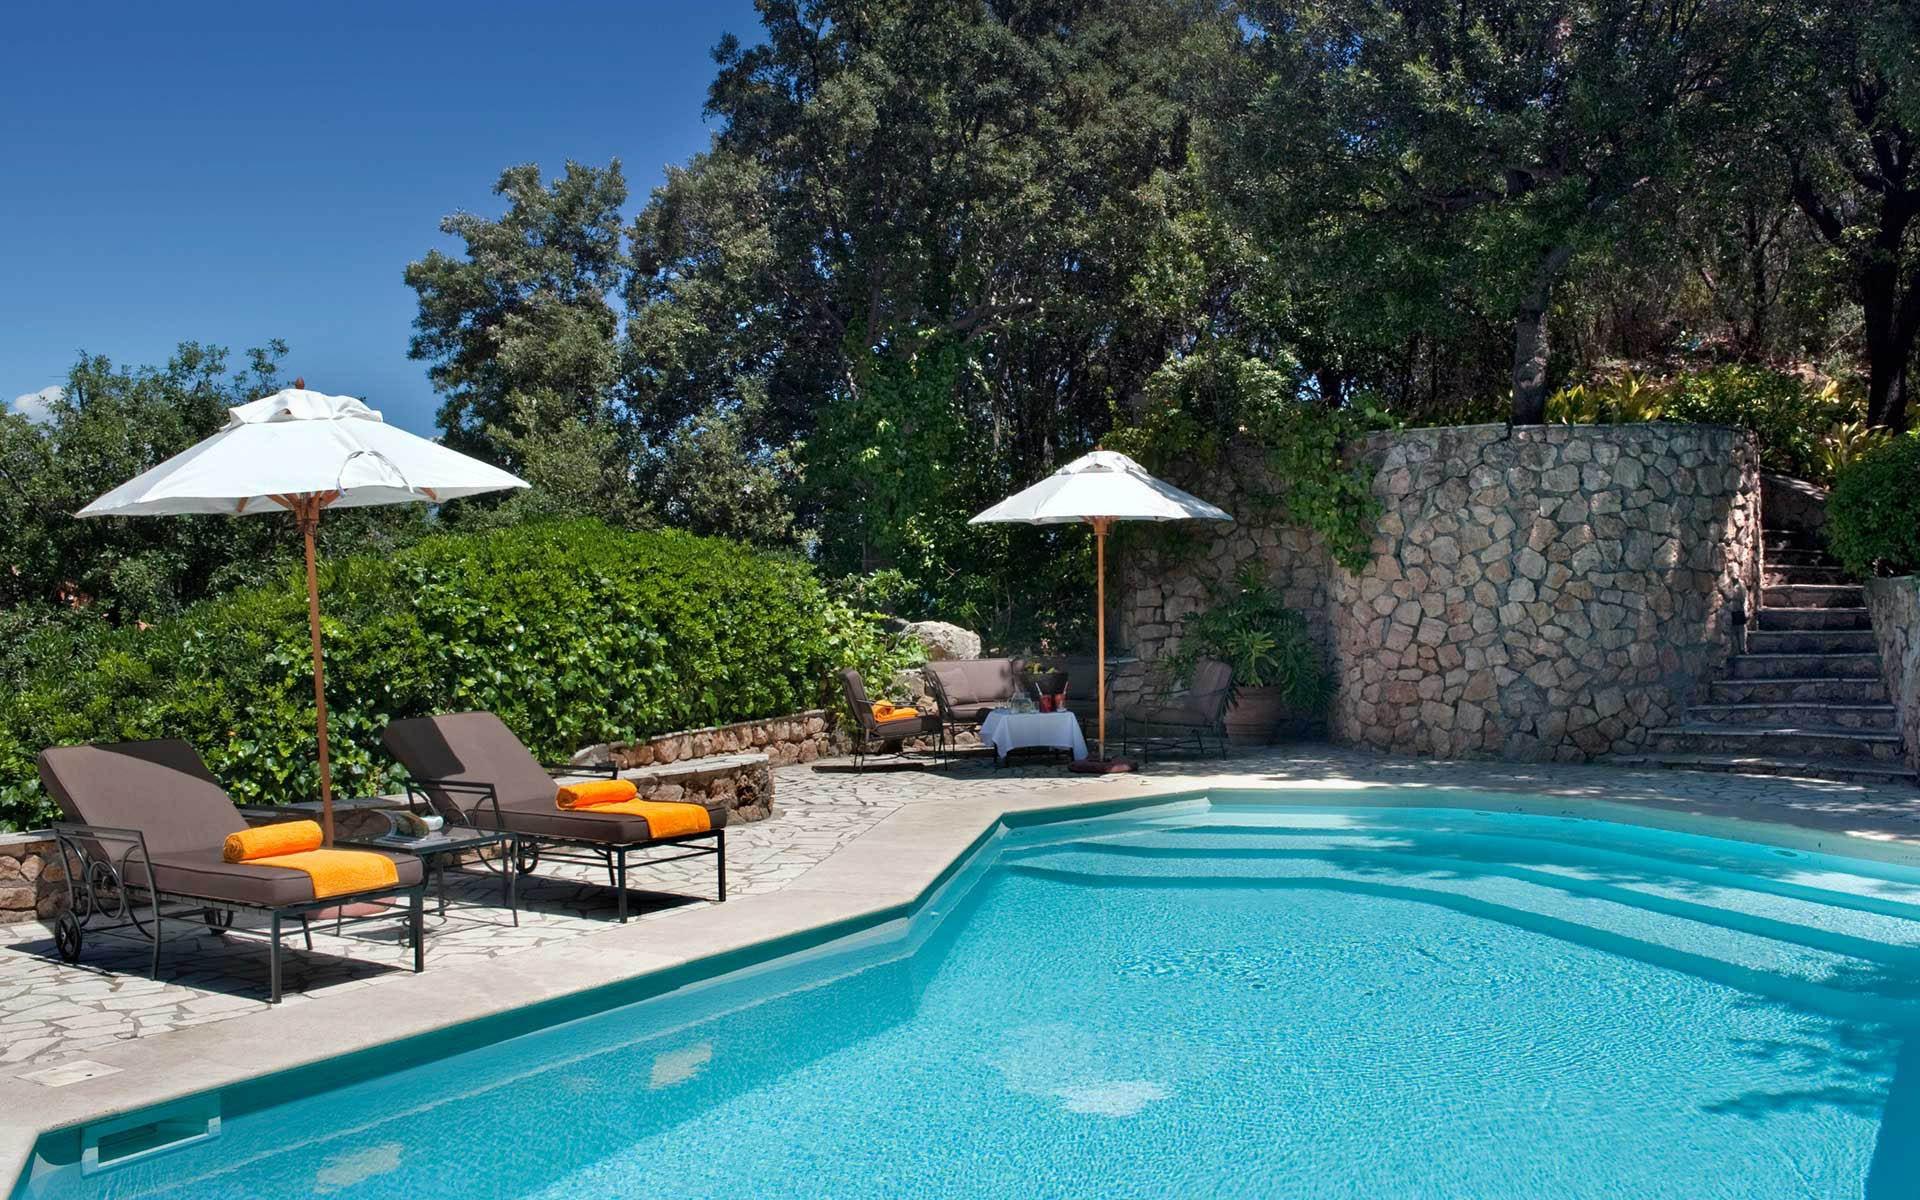 A pool facing the Mediterranean Sea - حمامات السباحة